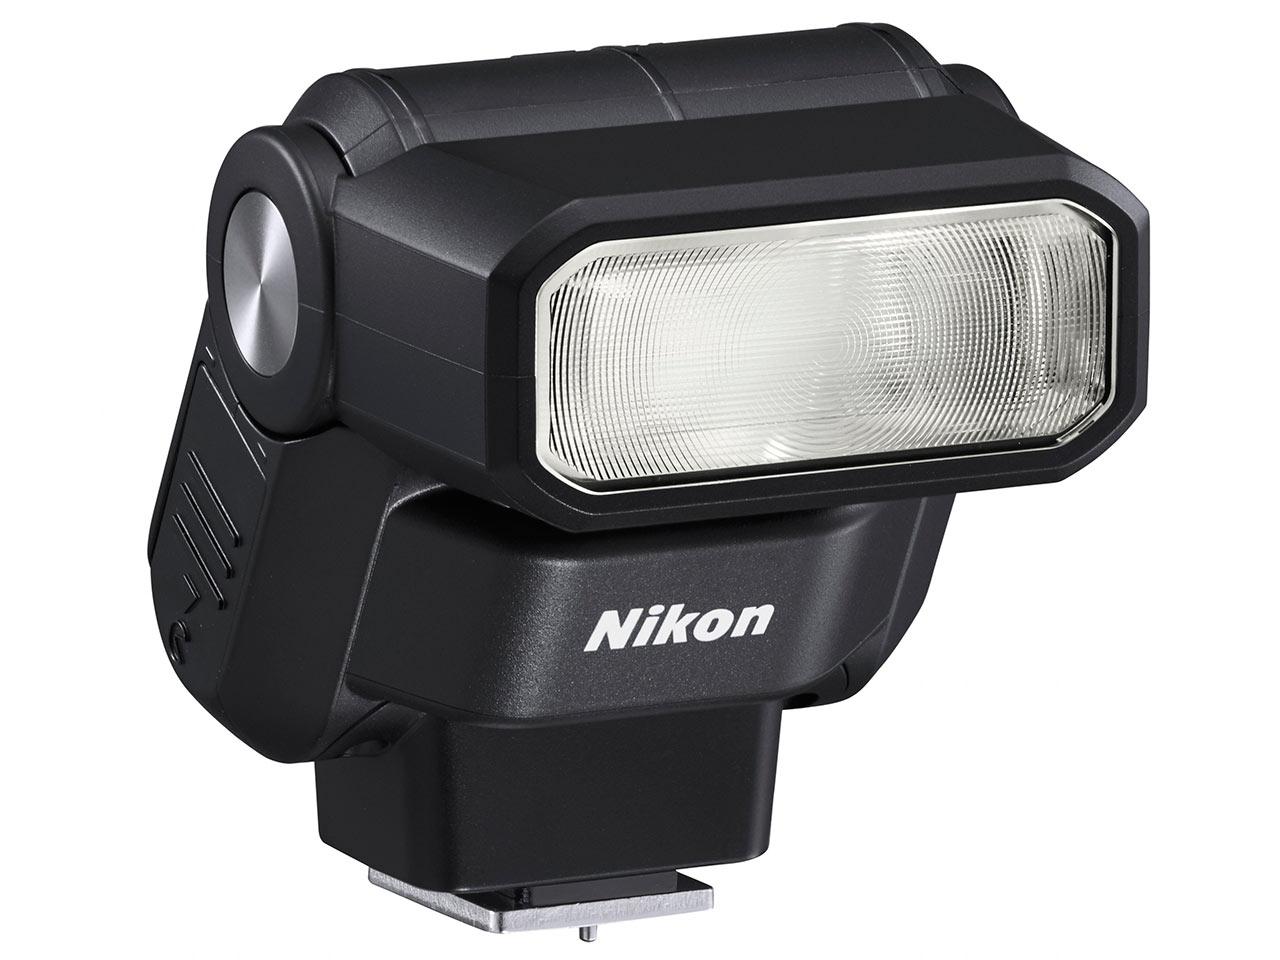 Nikon Adds Speedlight SB 300 Flashgun To Its Arsenal